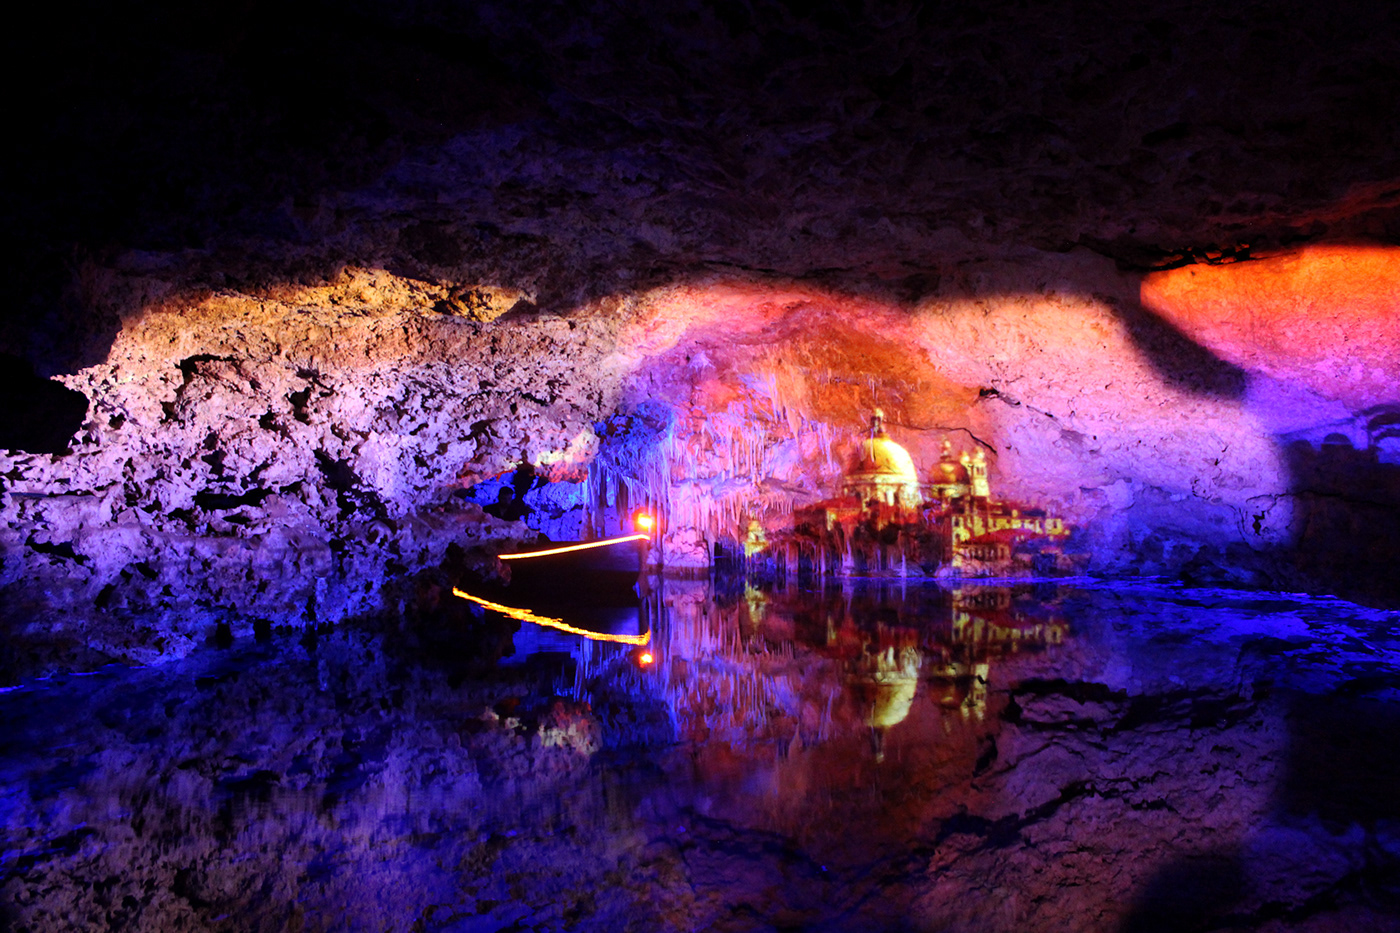 spain palmademallorca cuevas Caves colors photo Nature